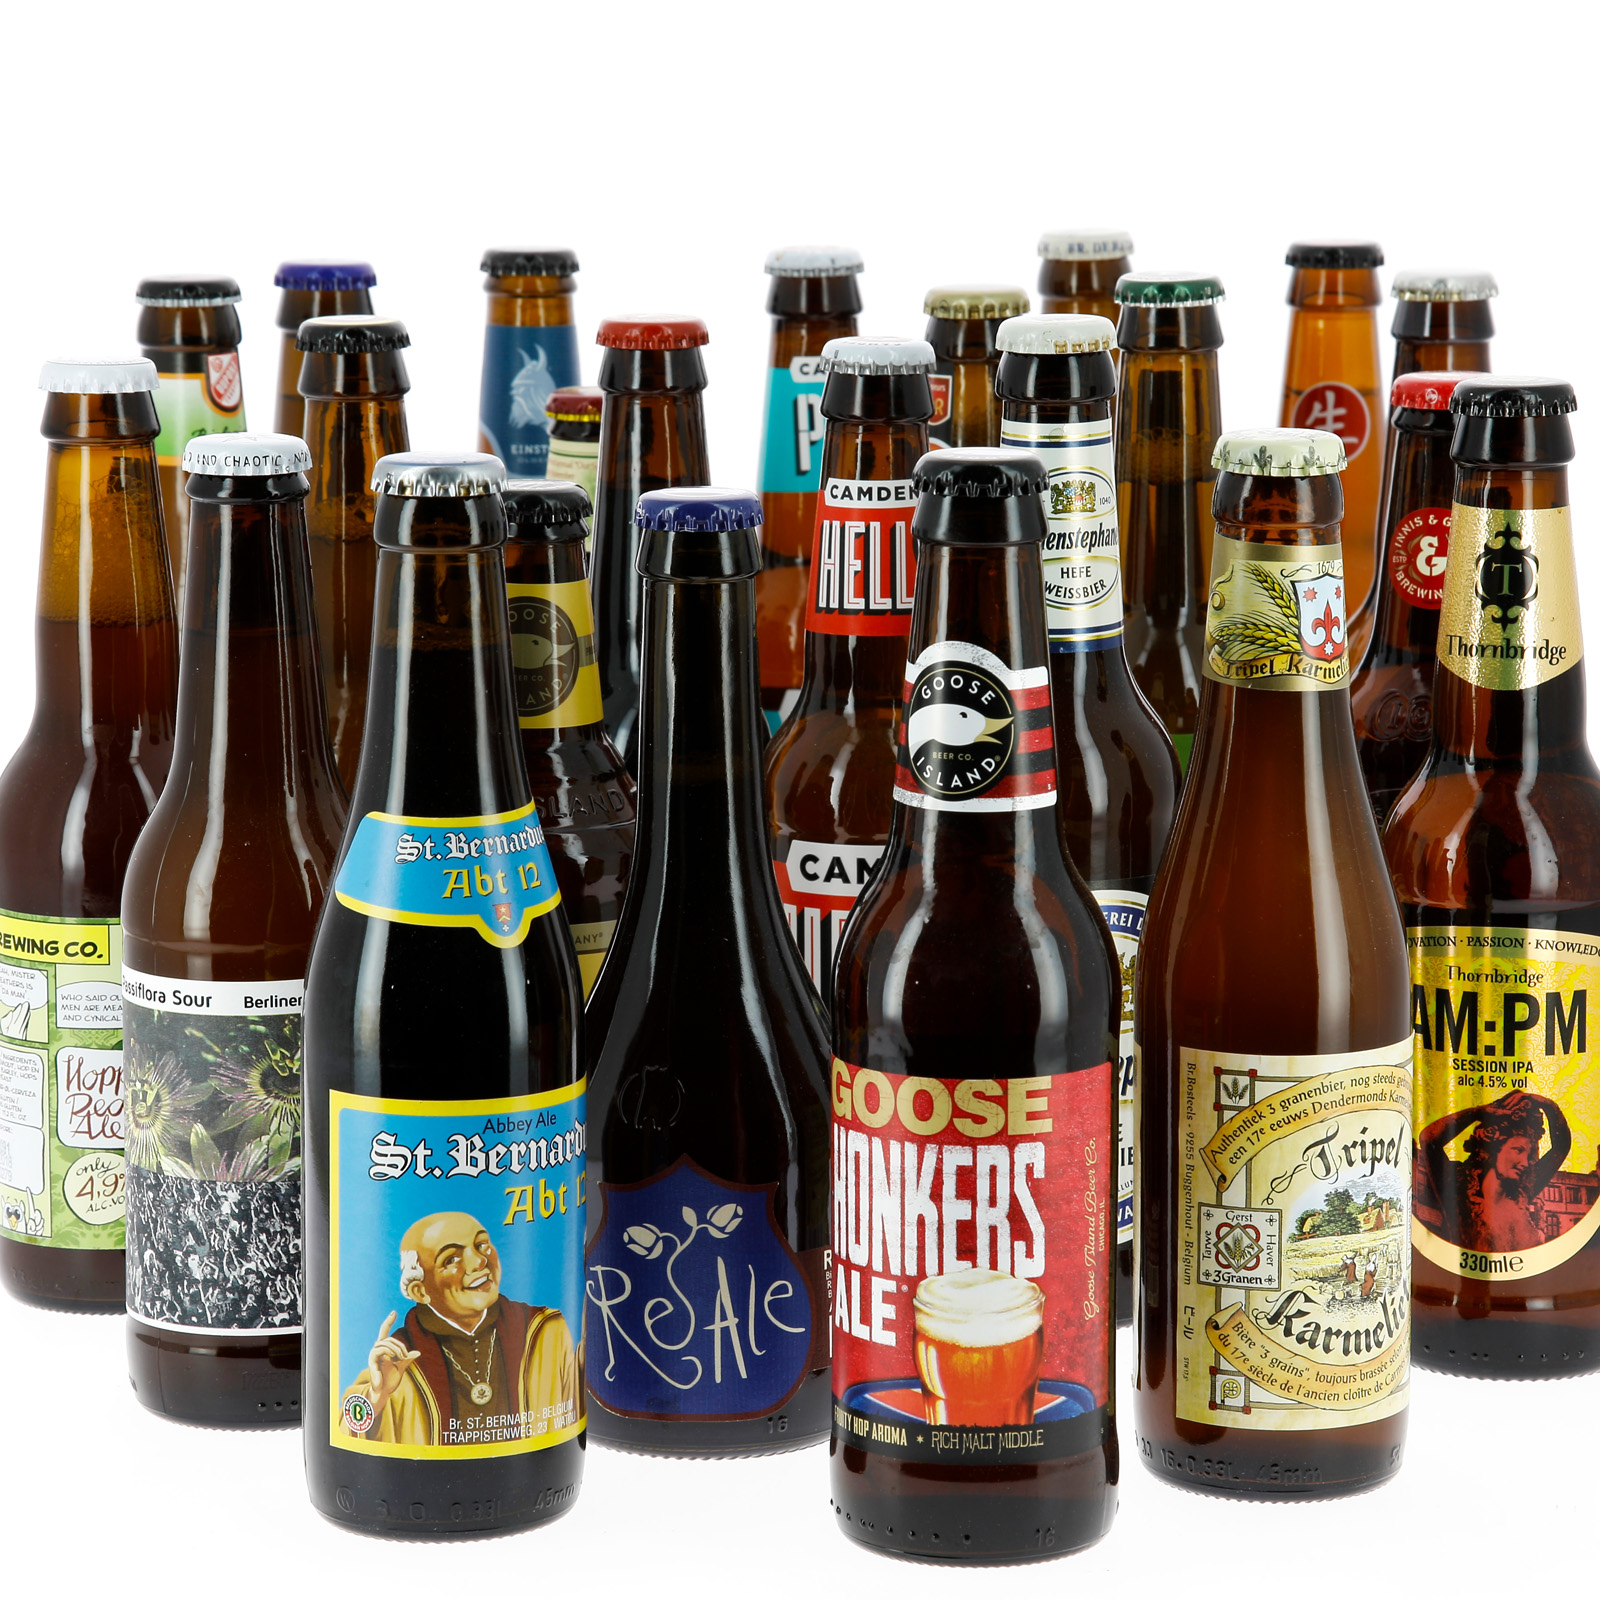 04493cedb17 Calendrier de l Avent bières du monde